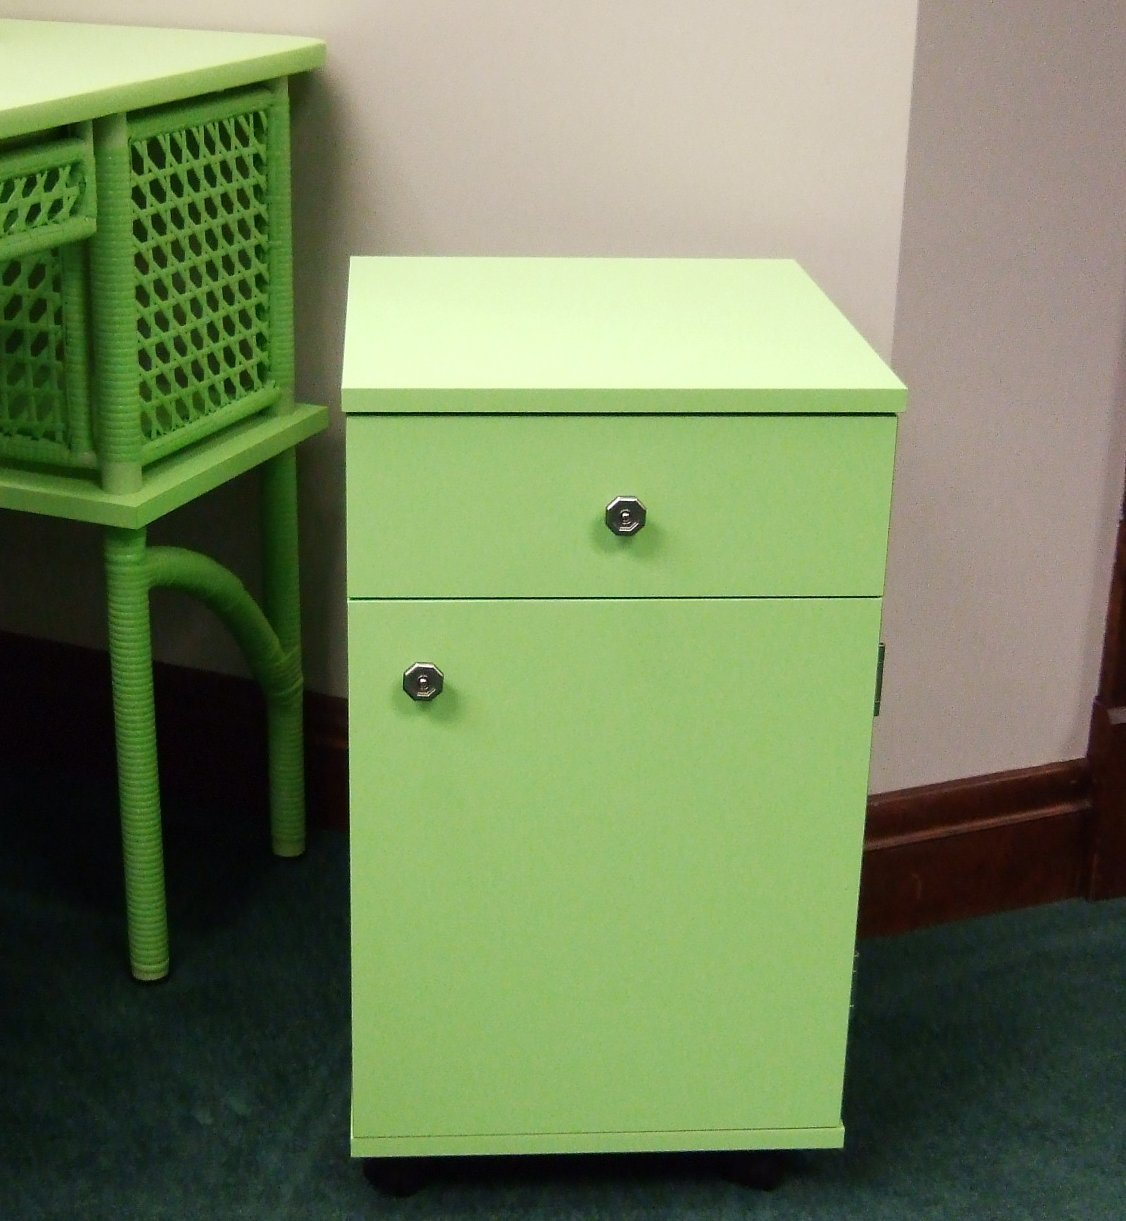 Arrow Sewing Cabinet Suzi Sewing Storage Cabinet with Four Drawer - Green Arrow Sewing Cabinet Suzi